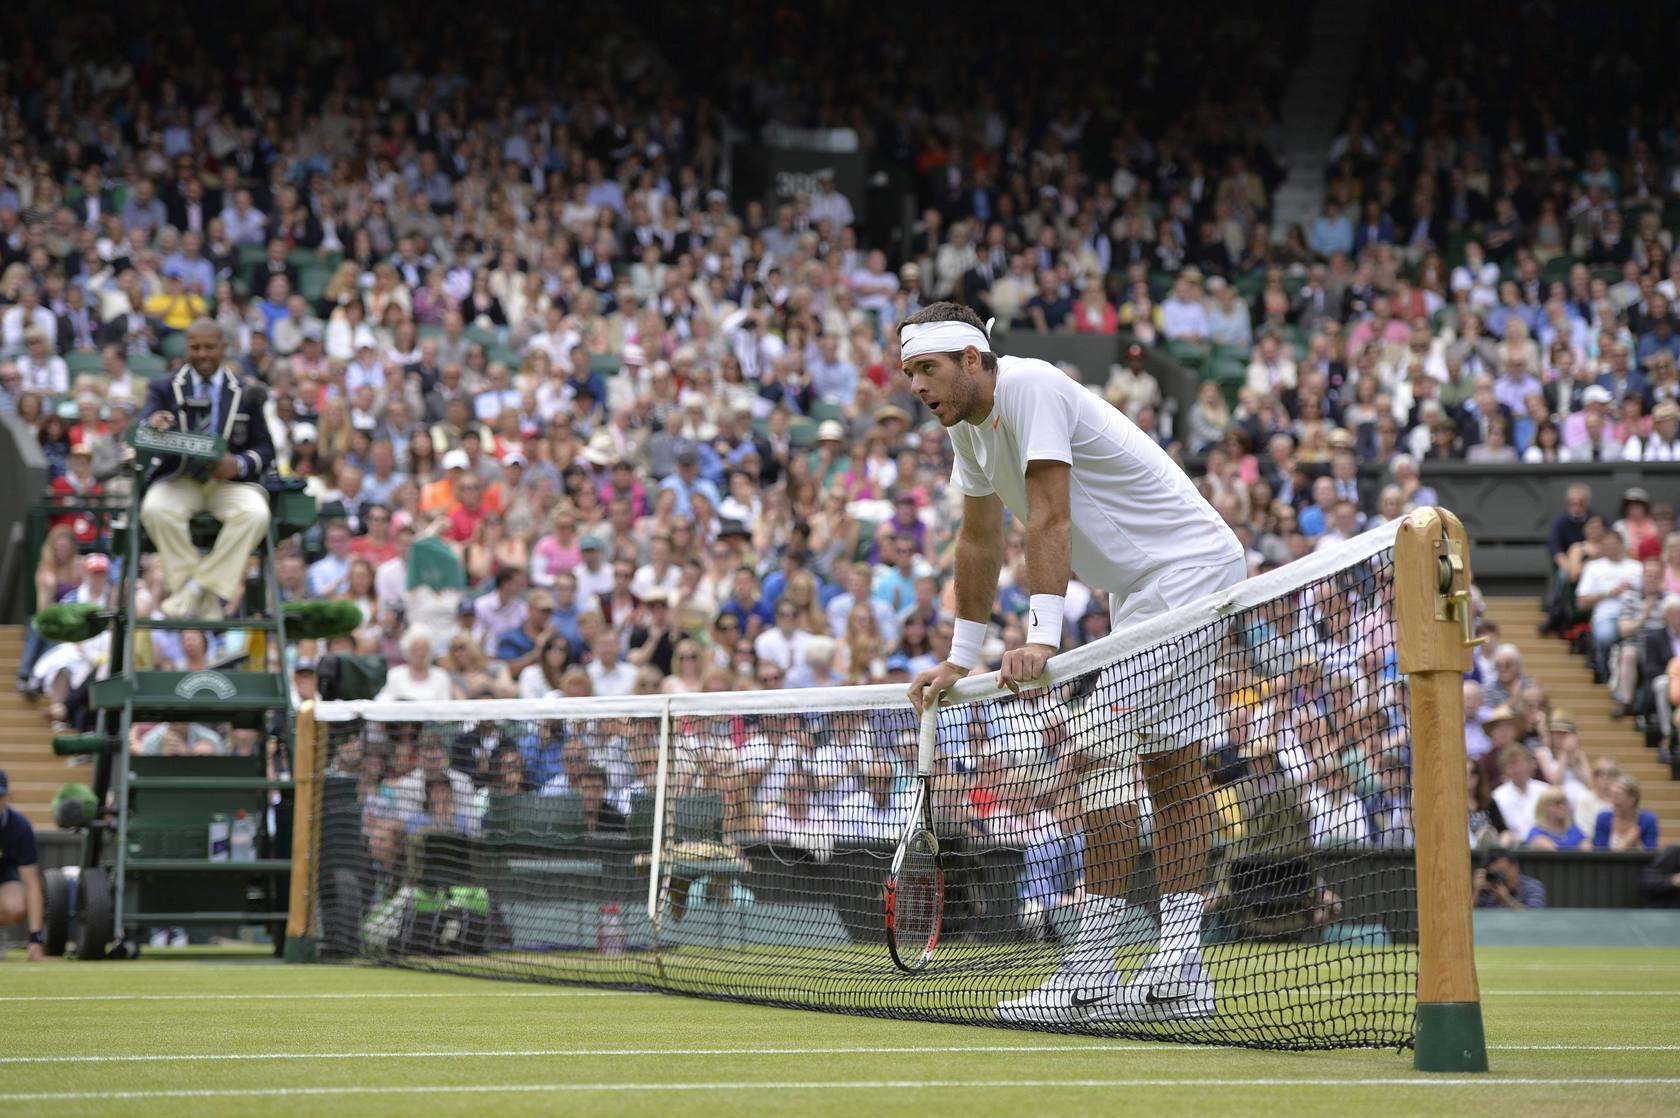 David Ferrer-Juan Martín del Potro en los cuartos de final de Wimbledon